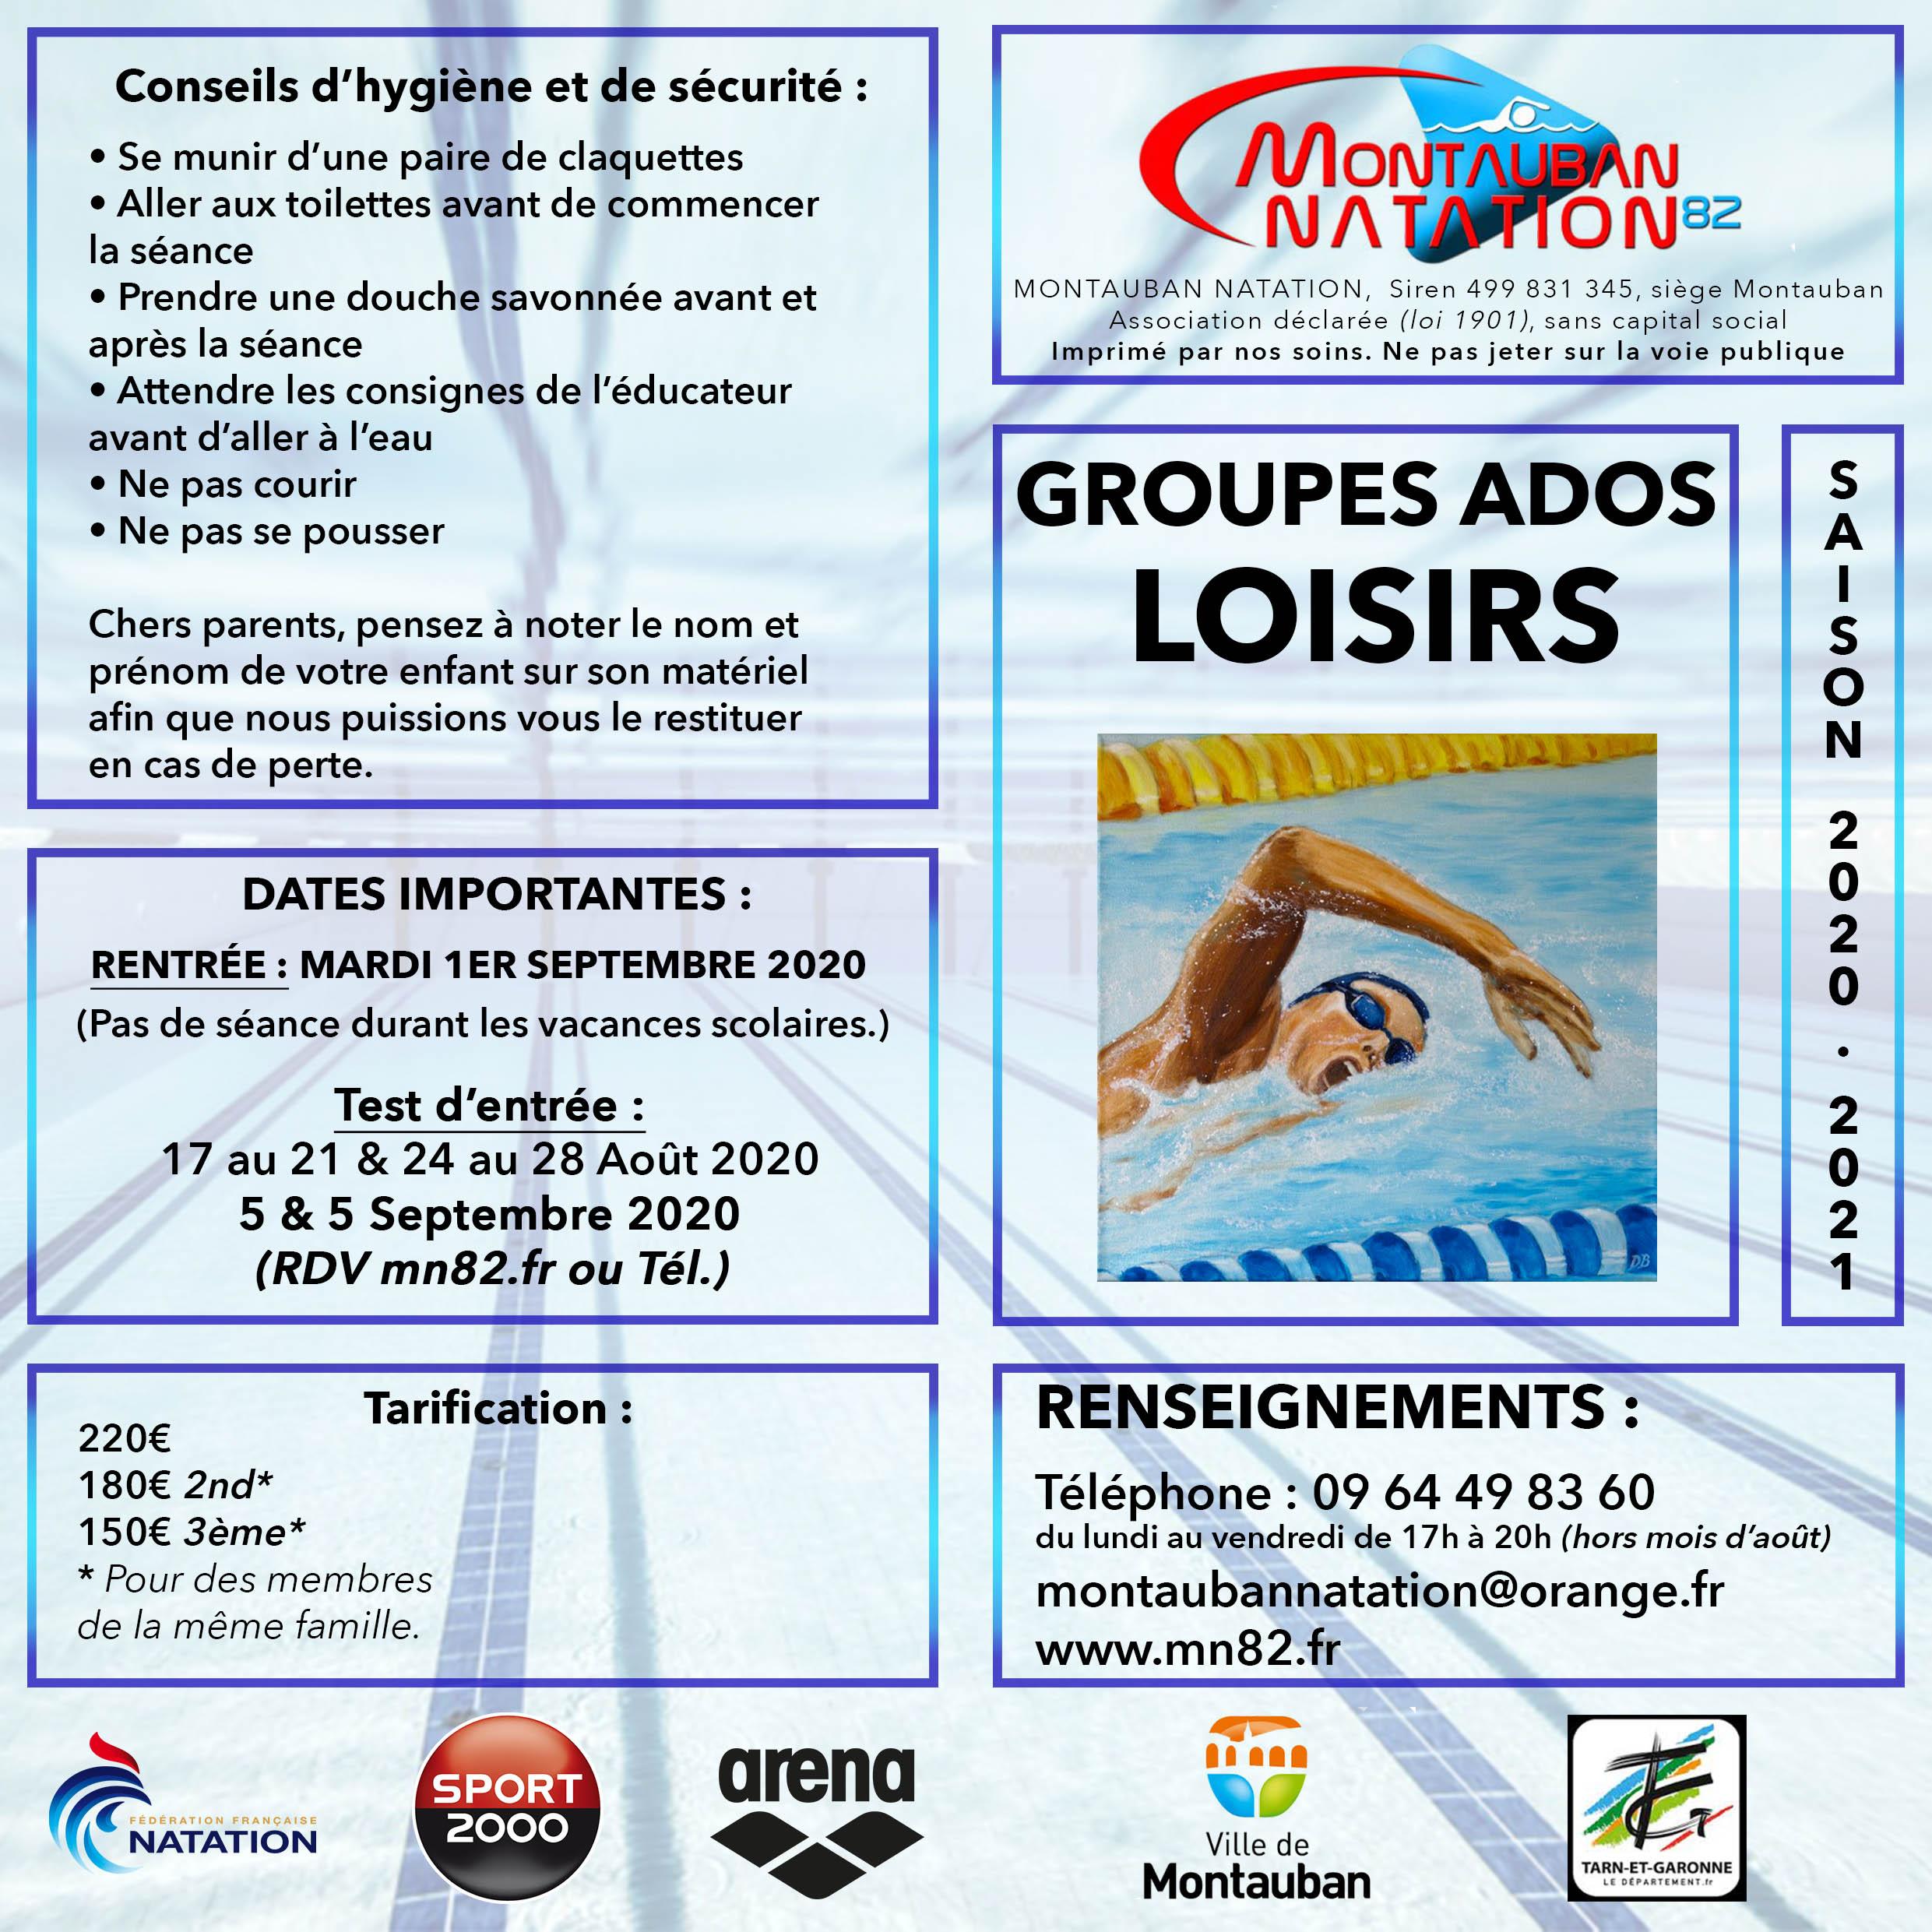 flyer présentation groupe Ados Loisirs MN82